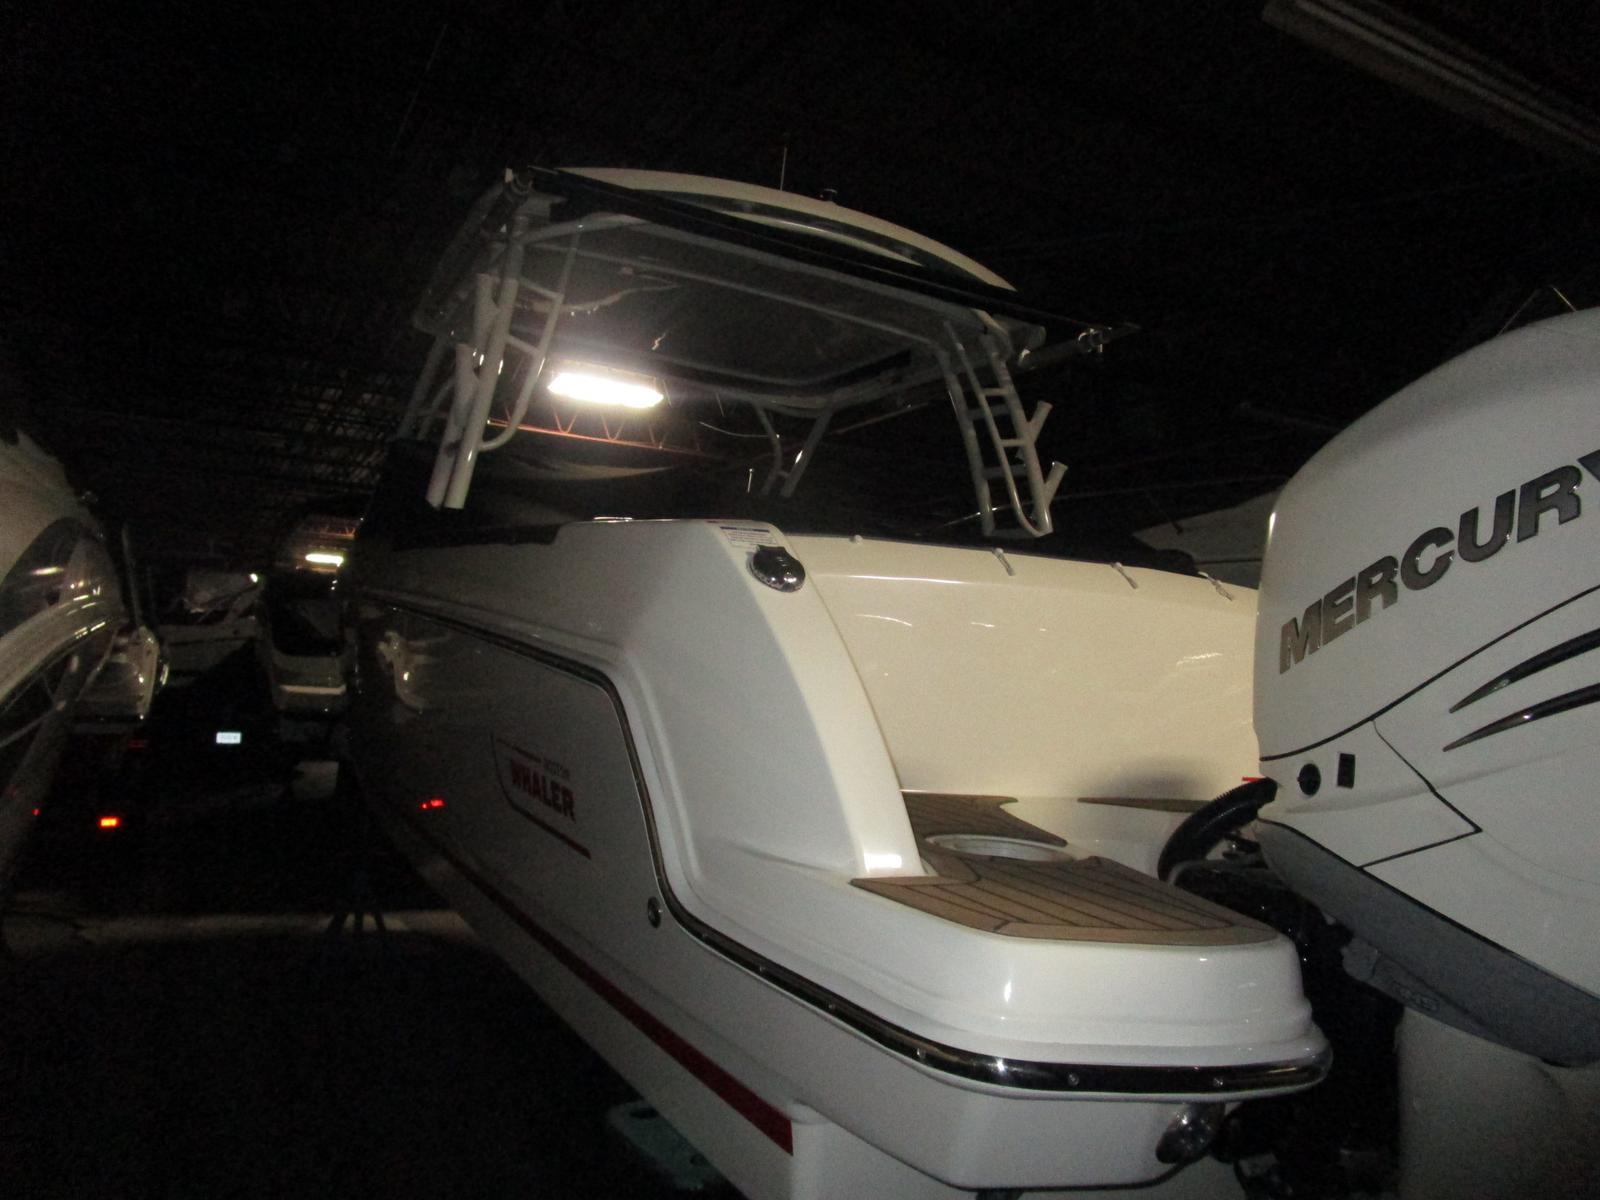 2017 Boston Whaler boat for sale, model of the boat is 270 Vantage Freshwater, Joystick, Loaded!!! & Image # 6 of 14